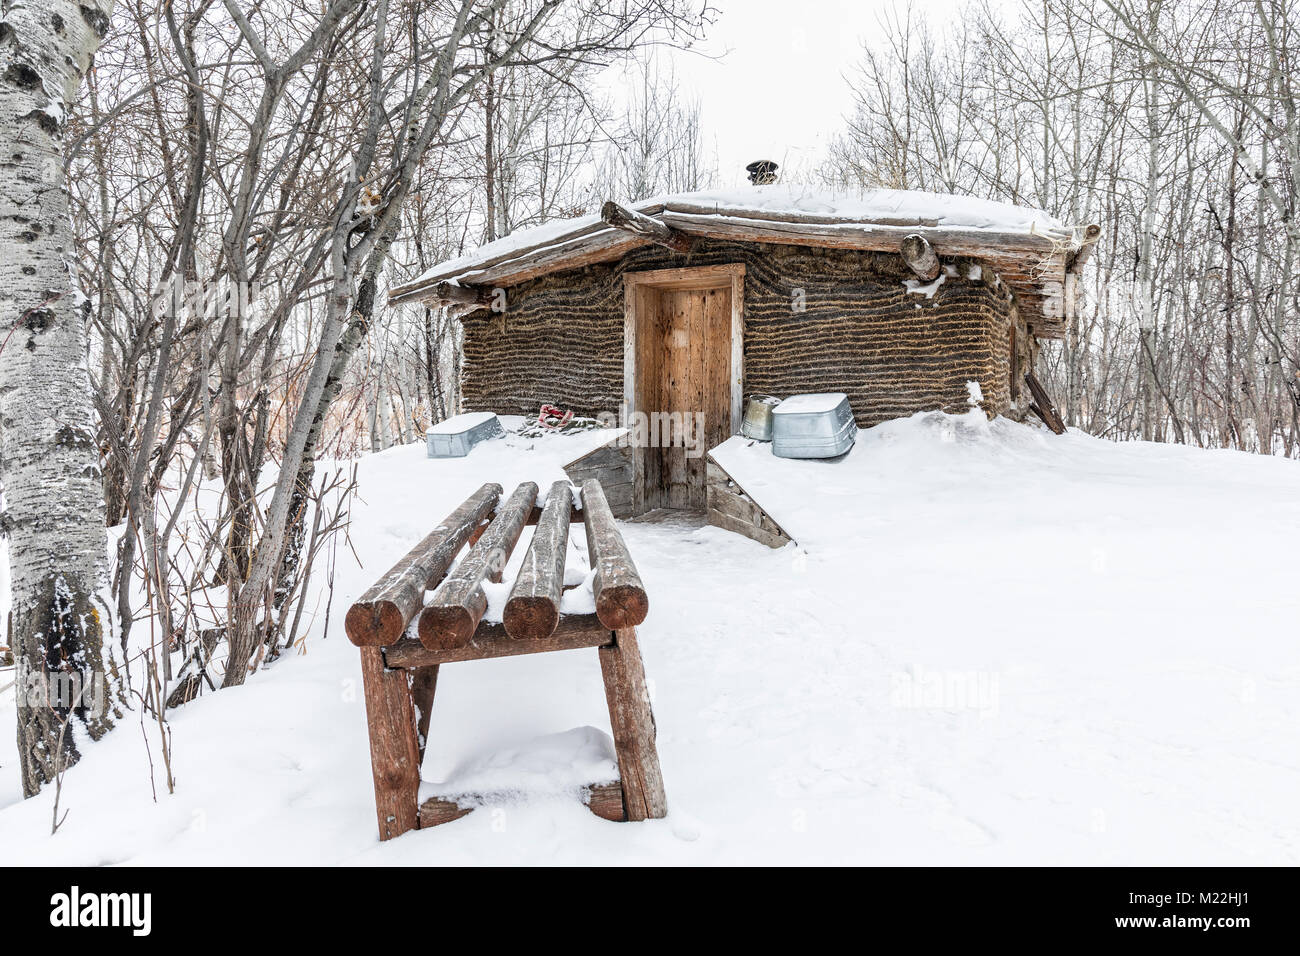 Sod house in winter, Manitoba, Canada. - Stock Image